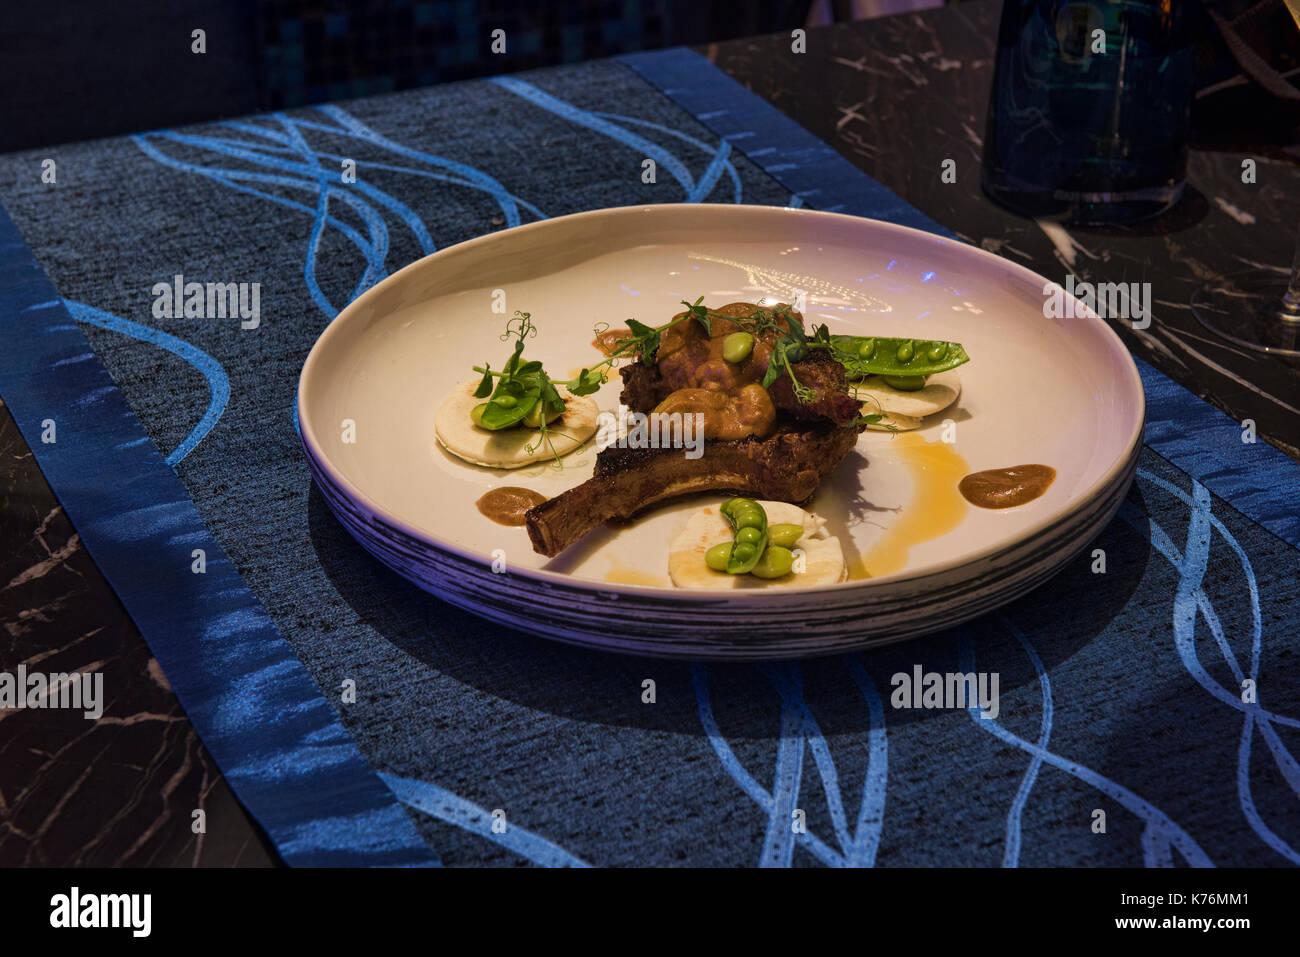 Elegante lammkoteletts molekulare küche bangkok thailand